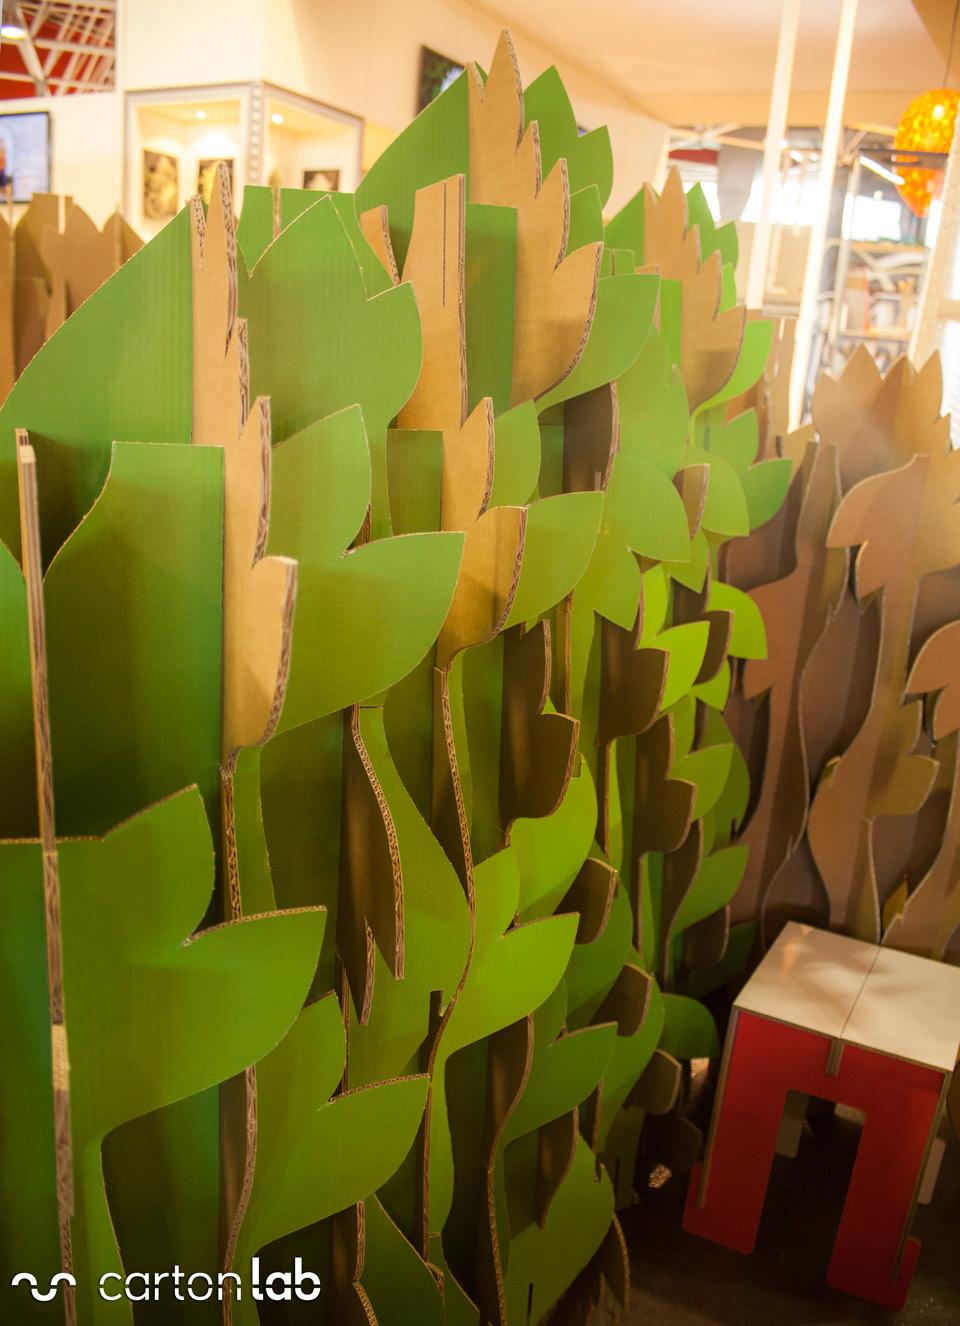 stand-spannabis-carton-barcelona (4)